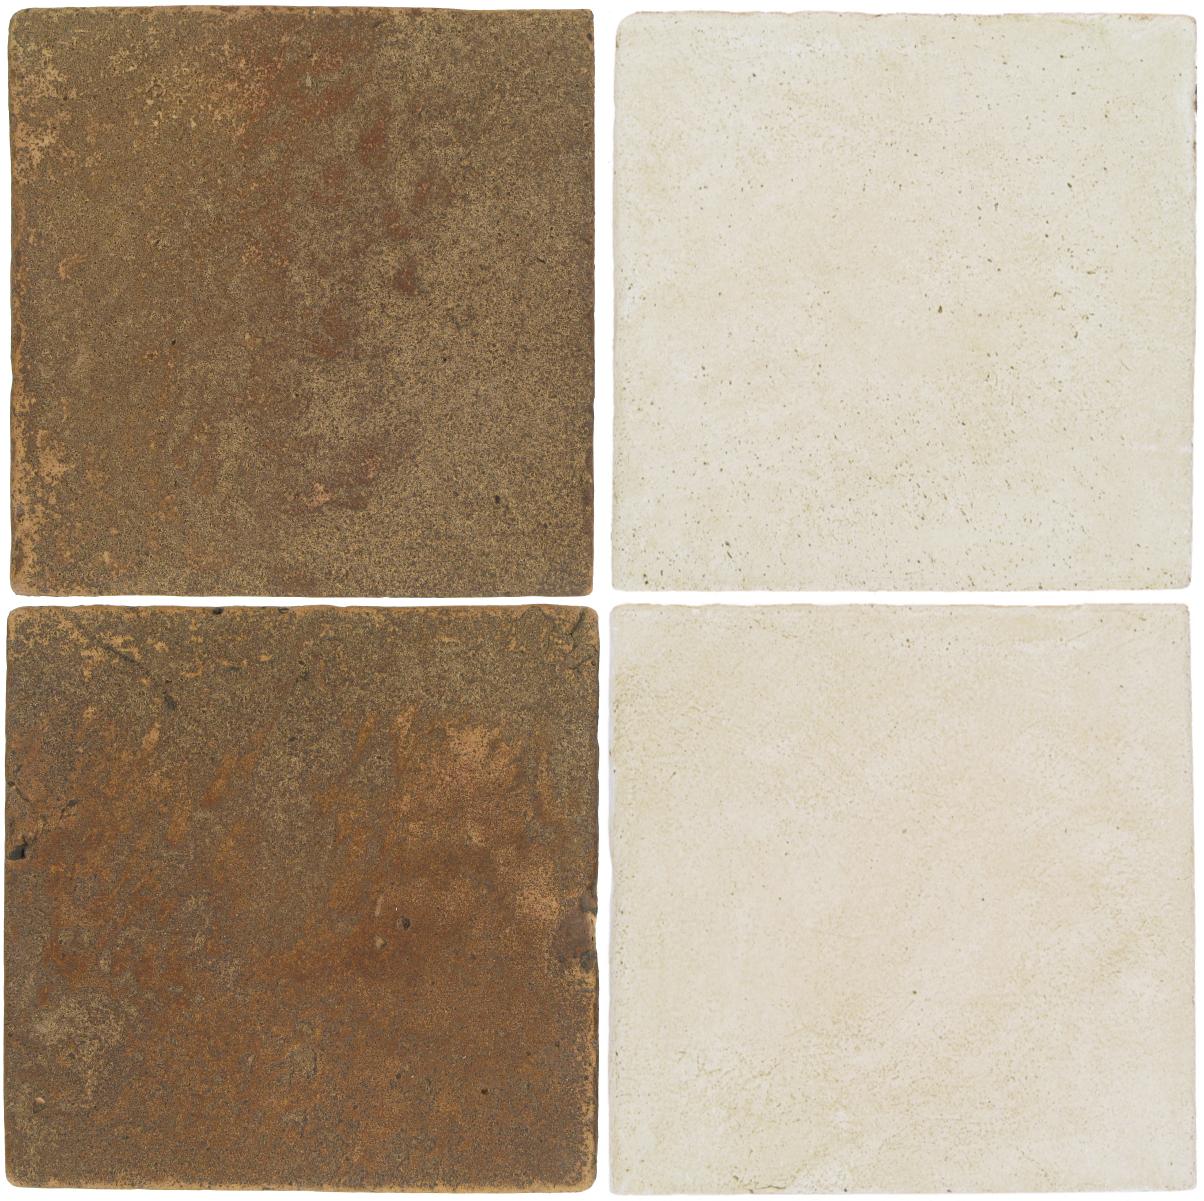 Pedralbes Antique Terracotta  2 Color Combinations  VTG-PSCM Camel Brown + OHS-PGAW Antique White